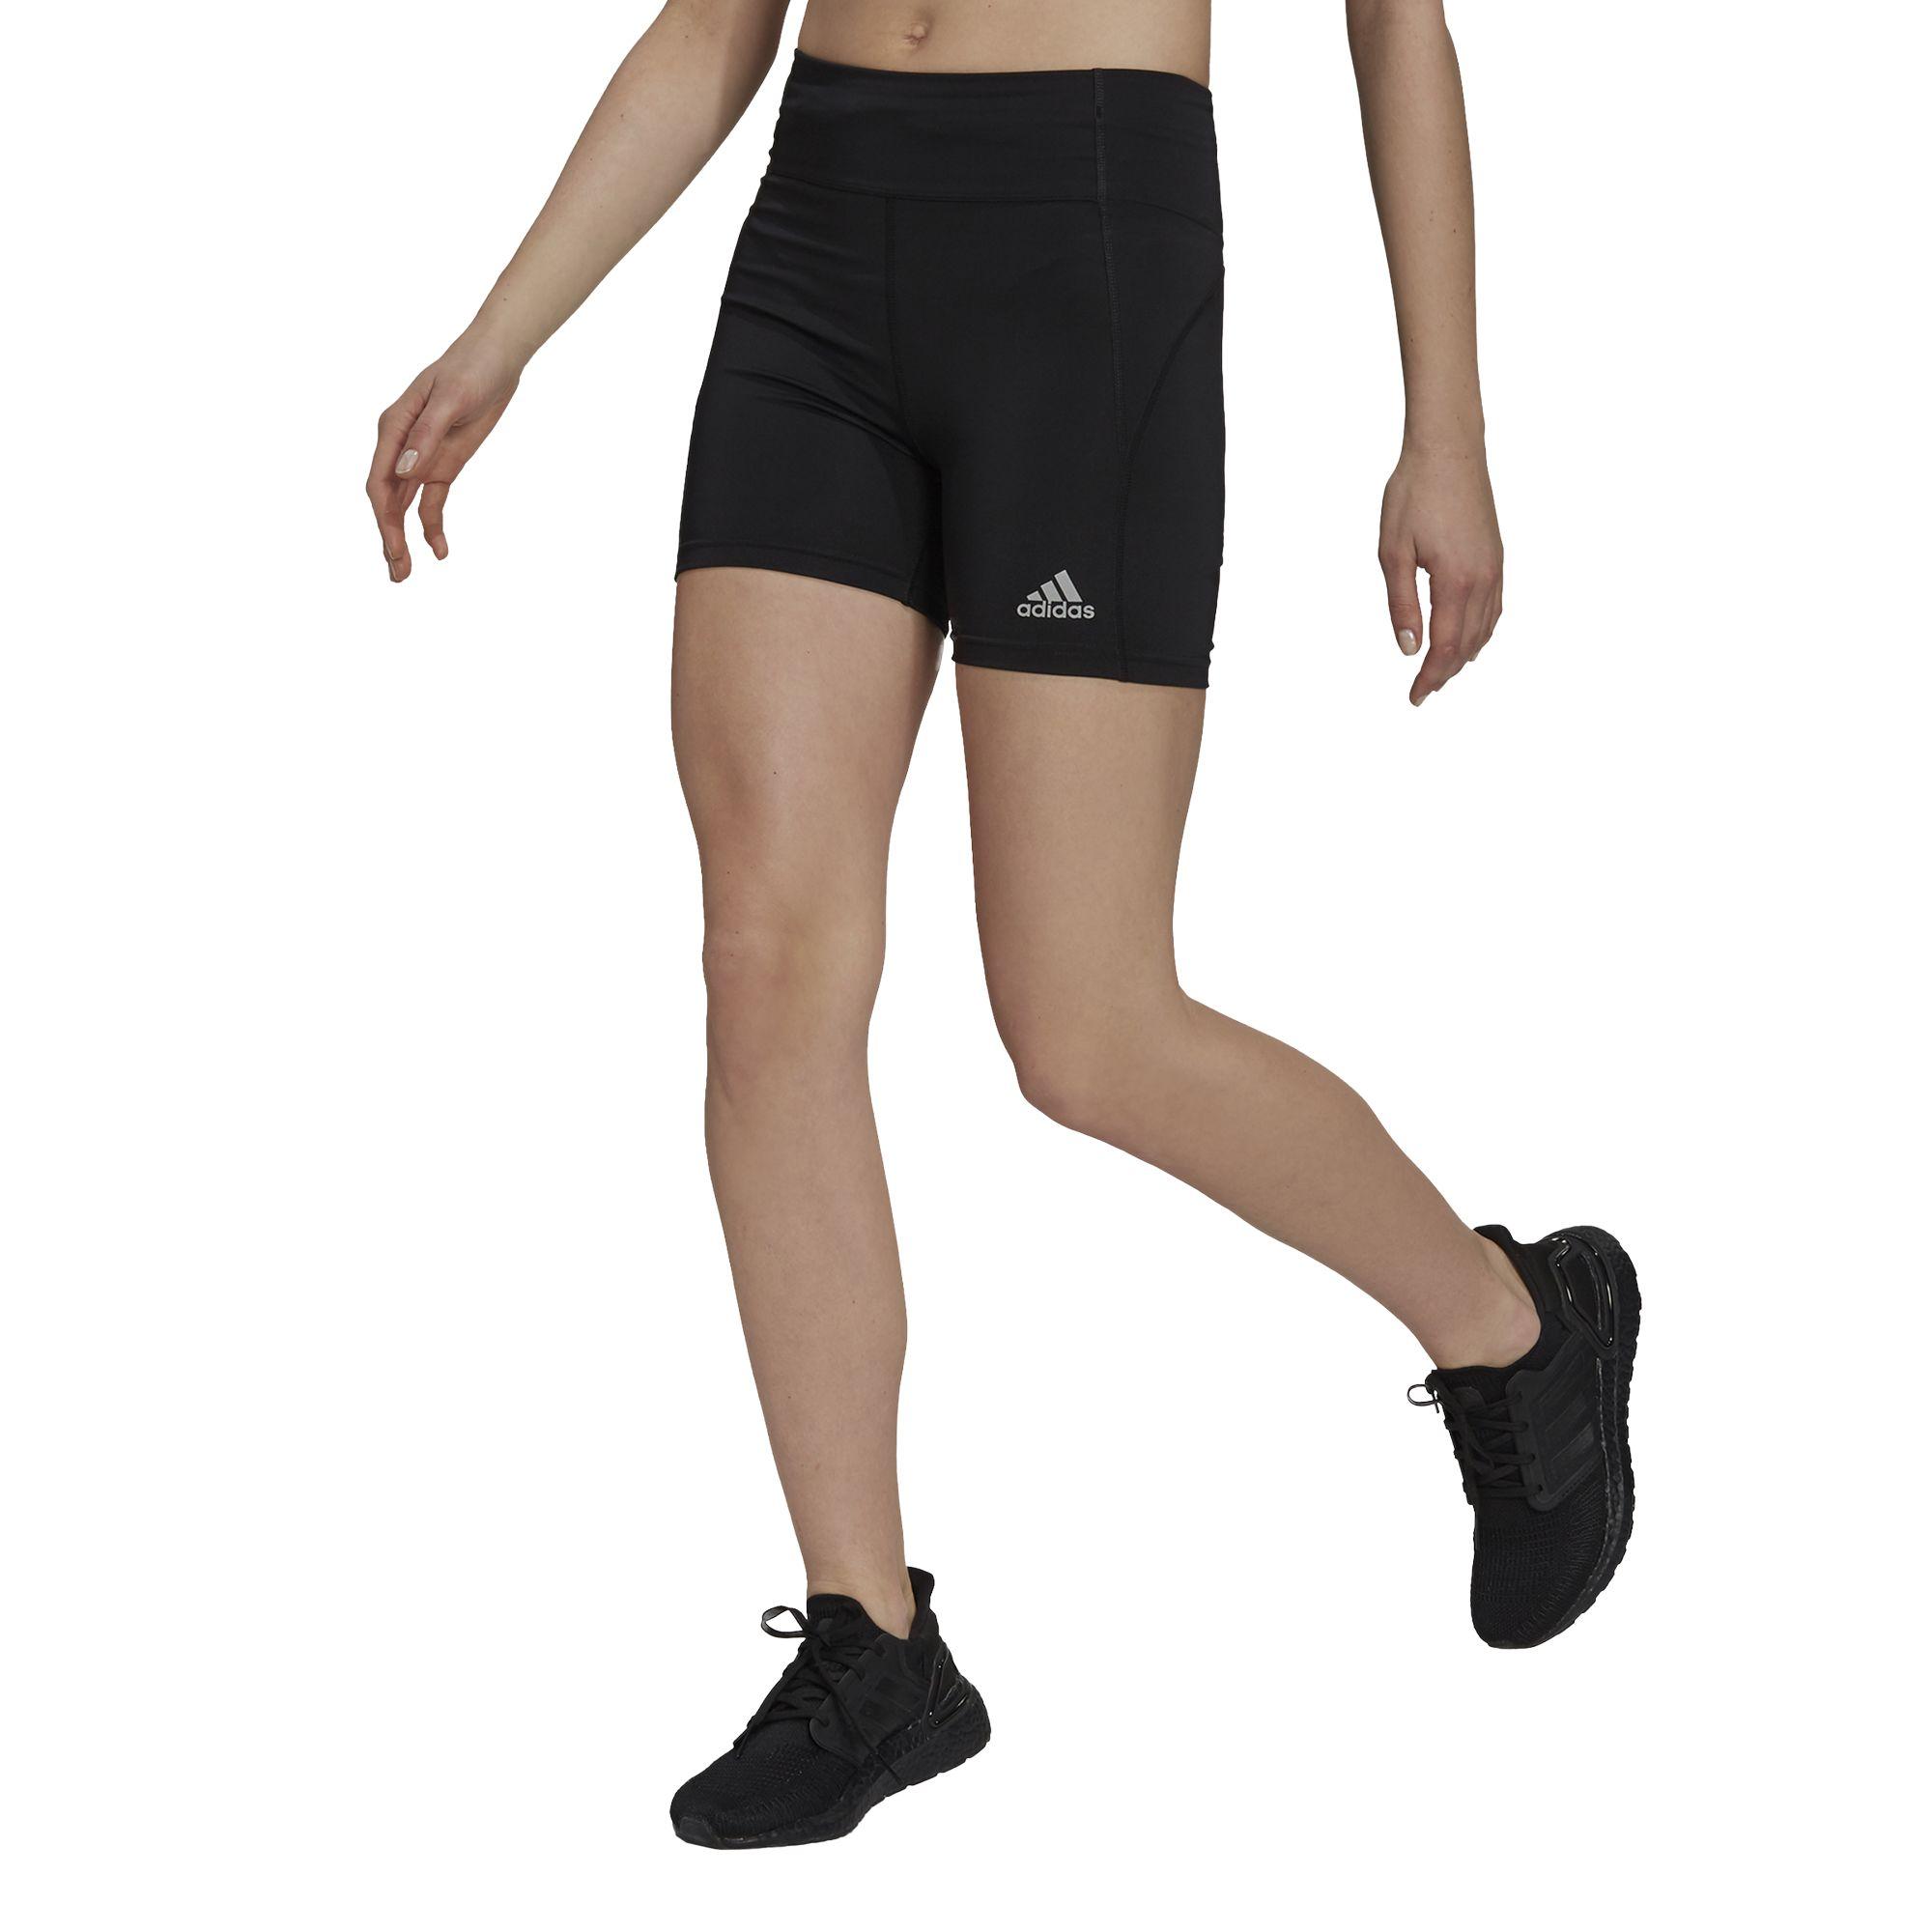 adidas Lady OTR Short Tight (Black)